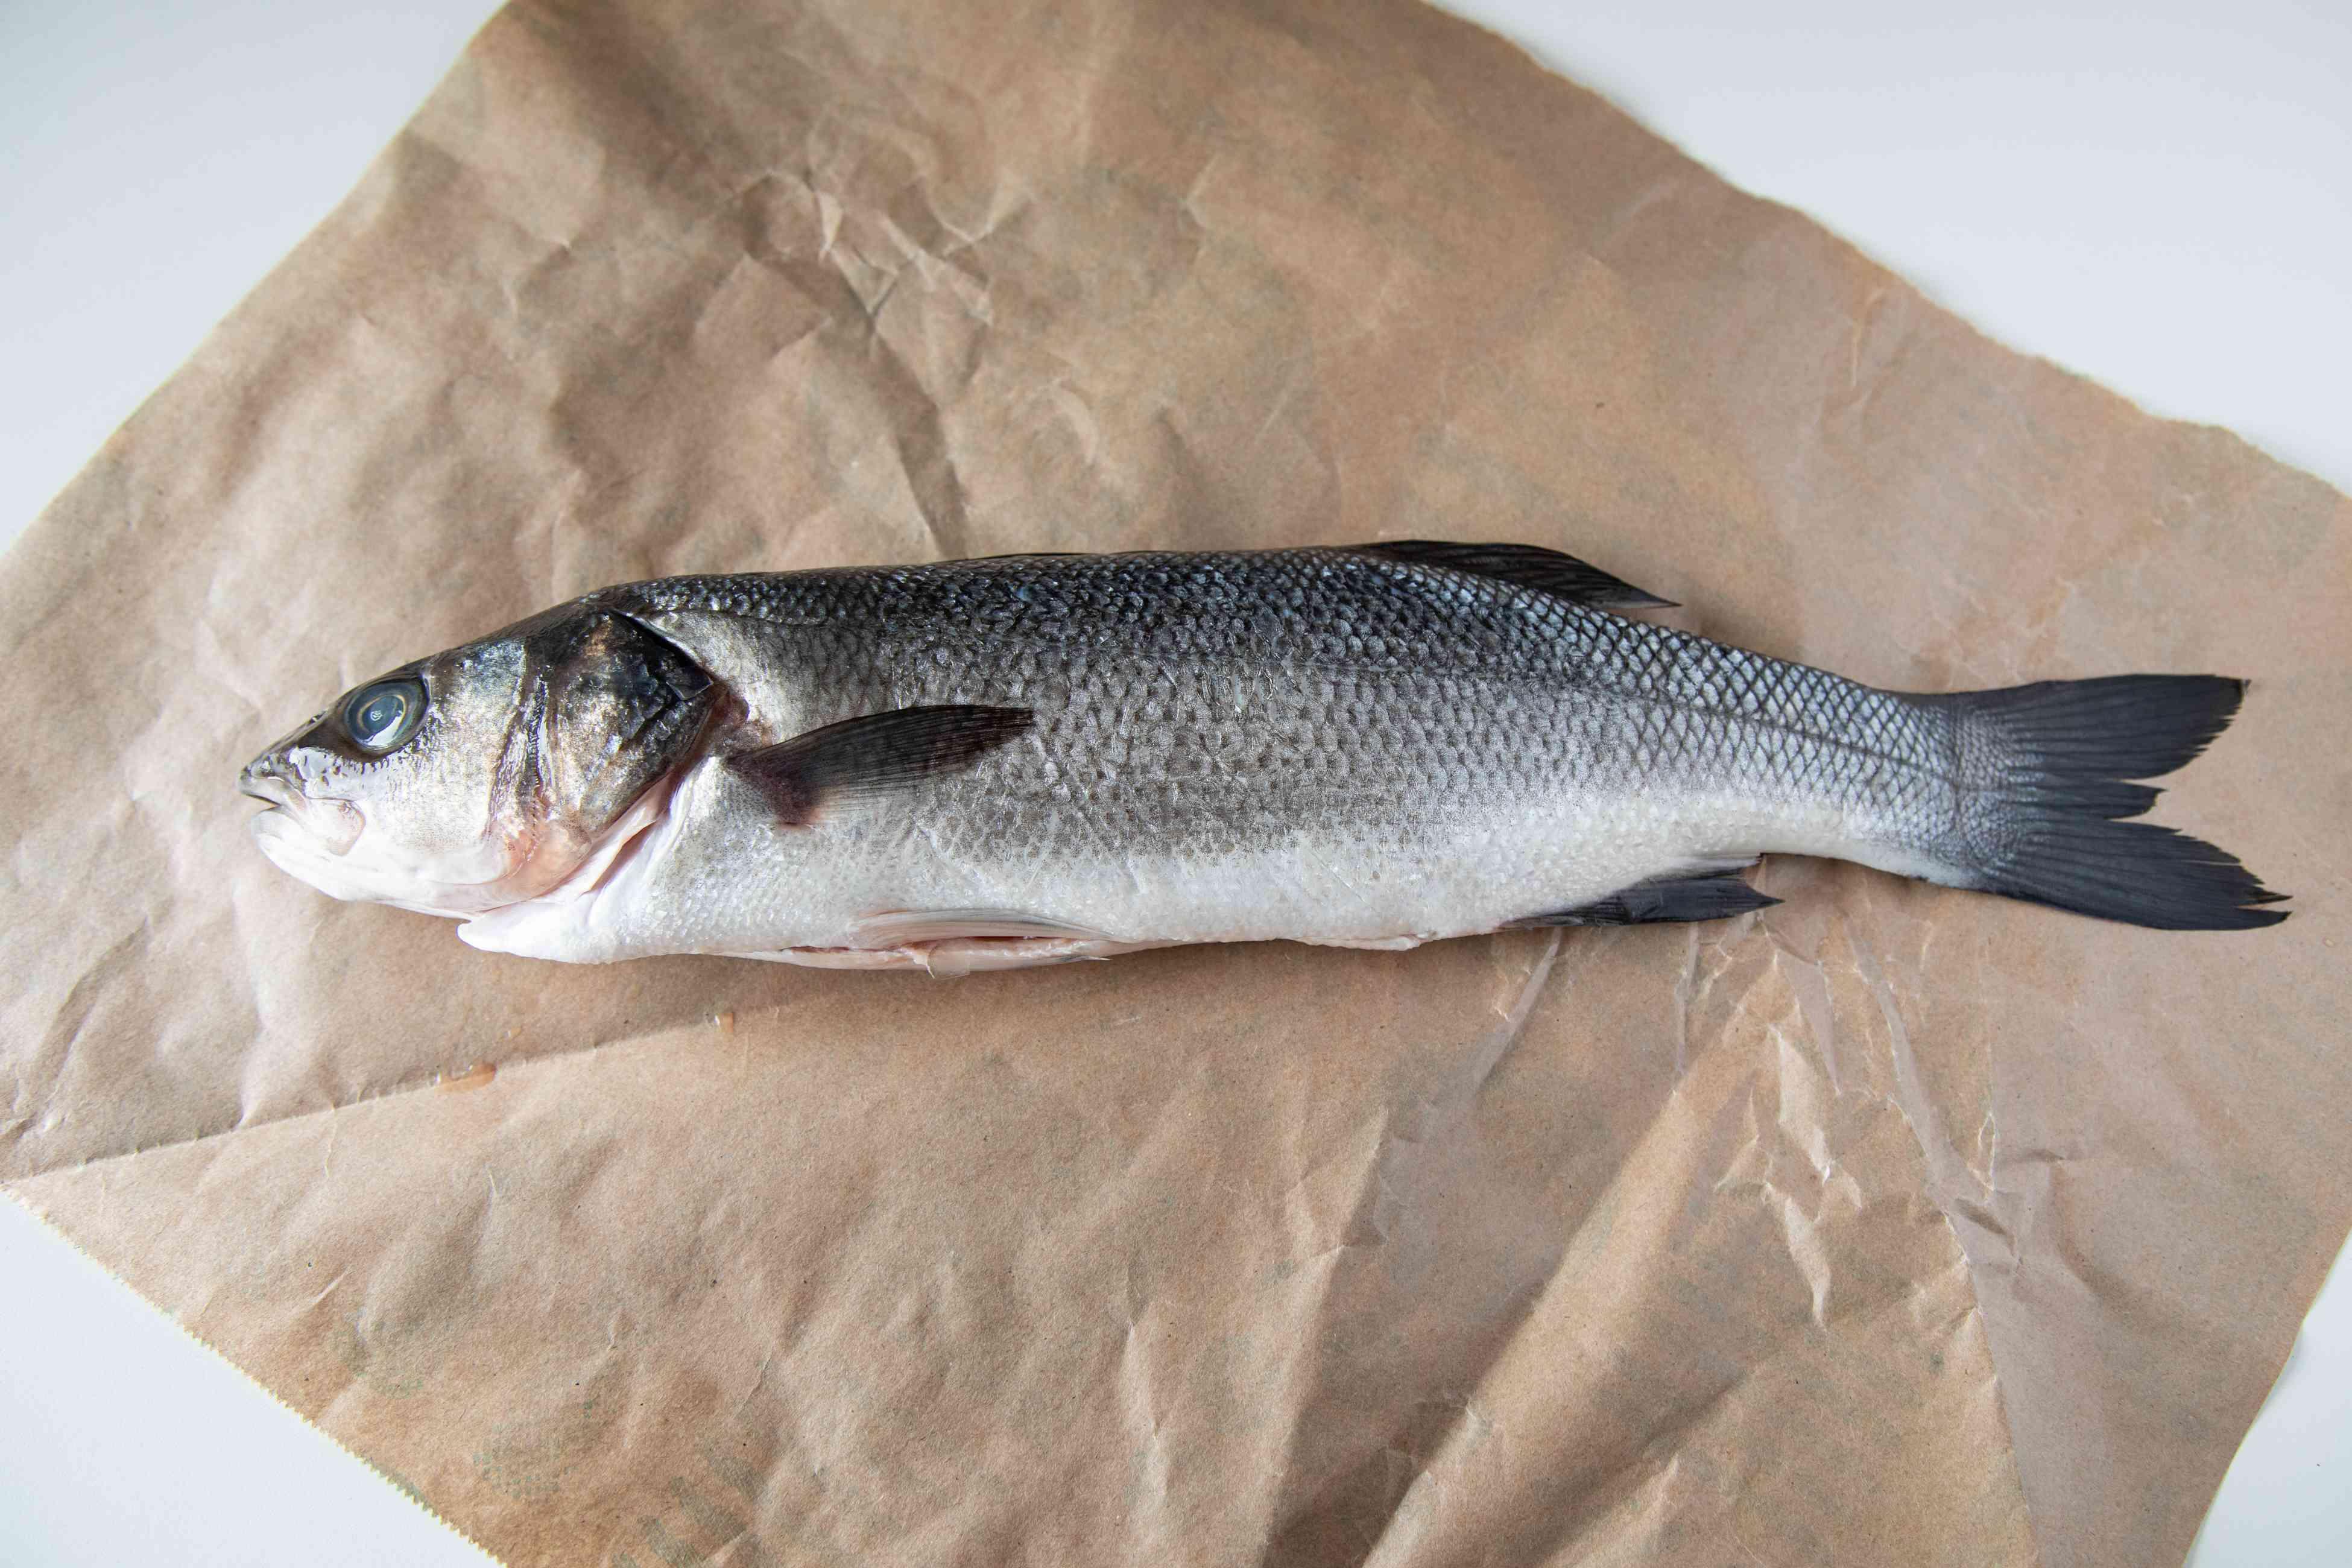 A whole branzino fish set on a piece of parchment paper.